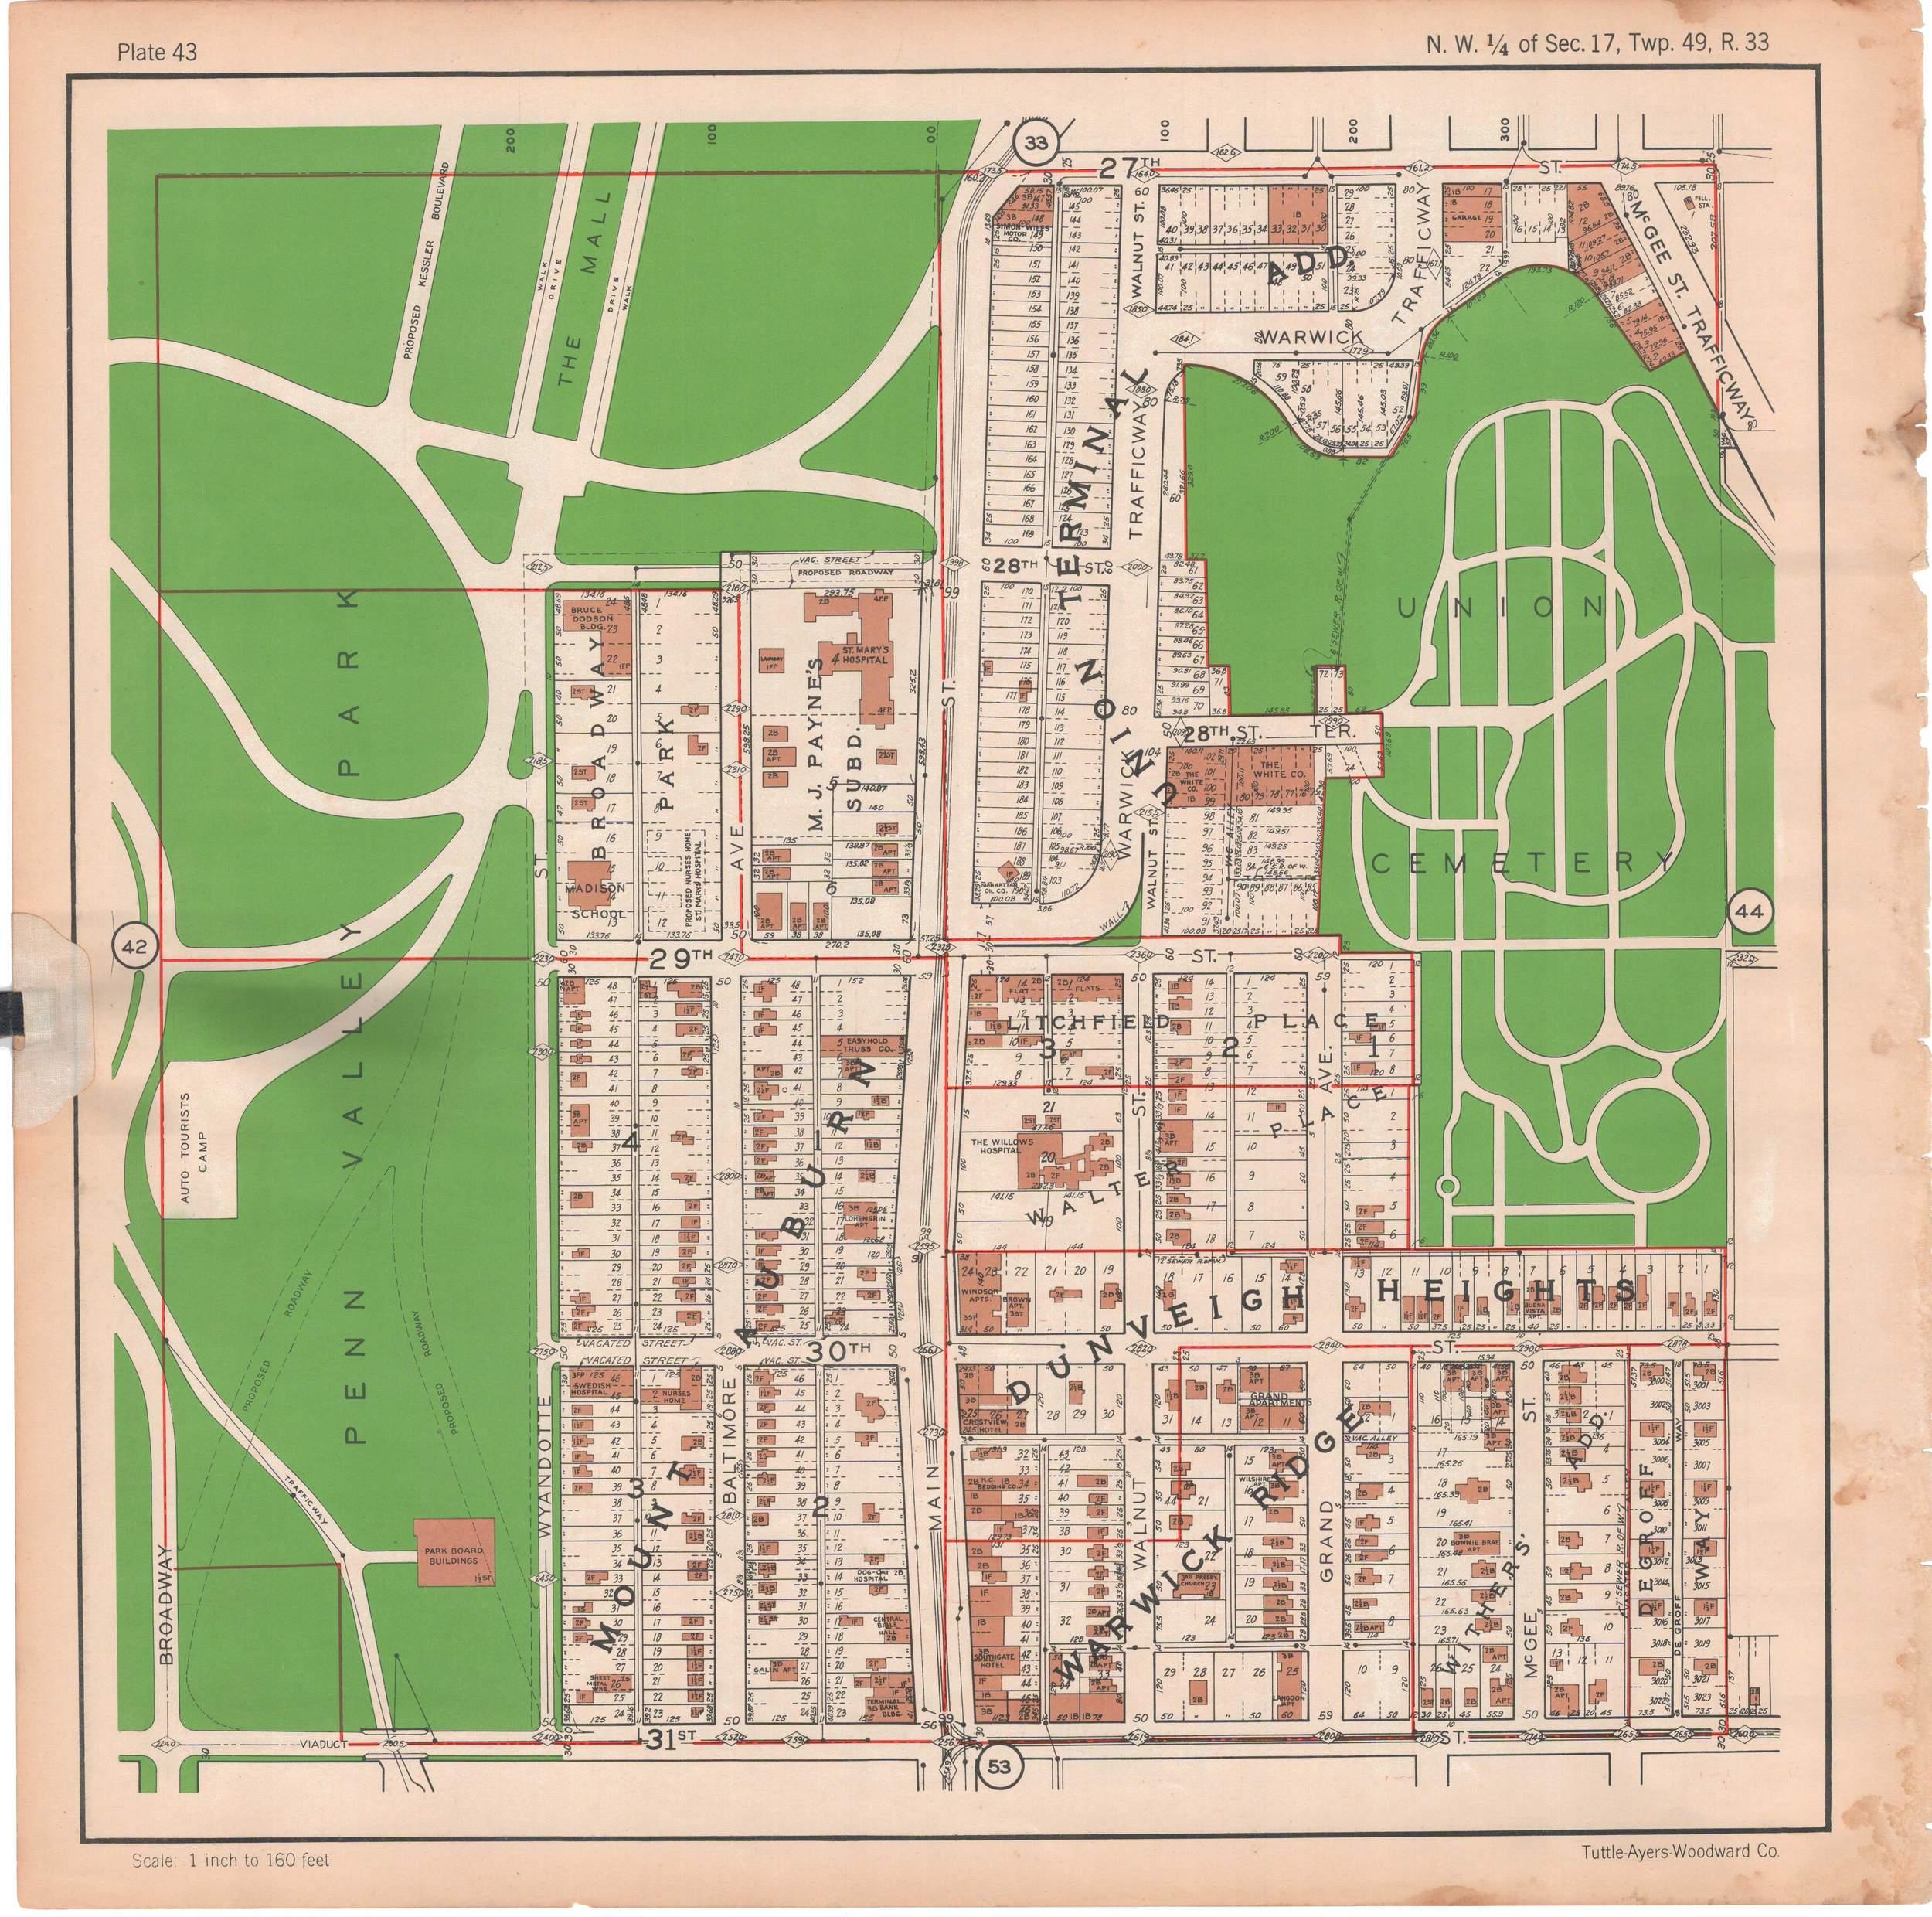 1925 TUTTLE_AYERS_Plate 43.JPG